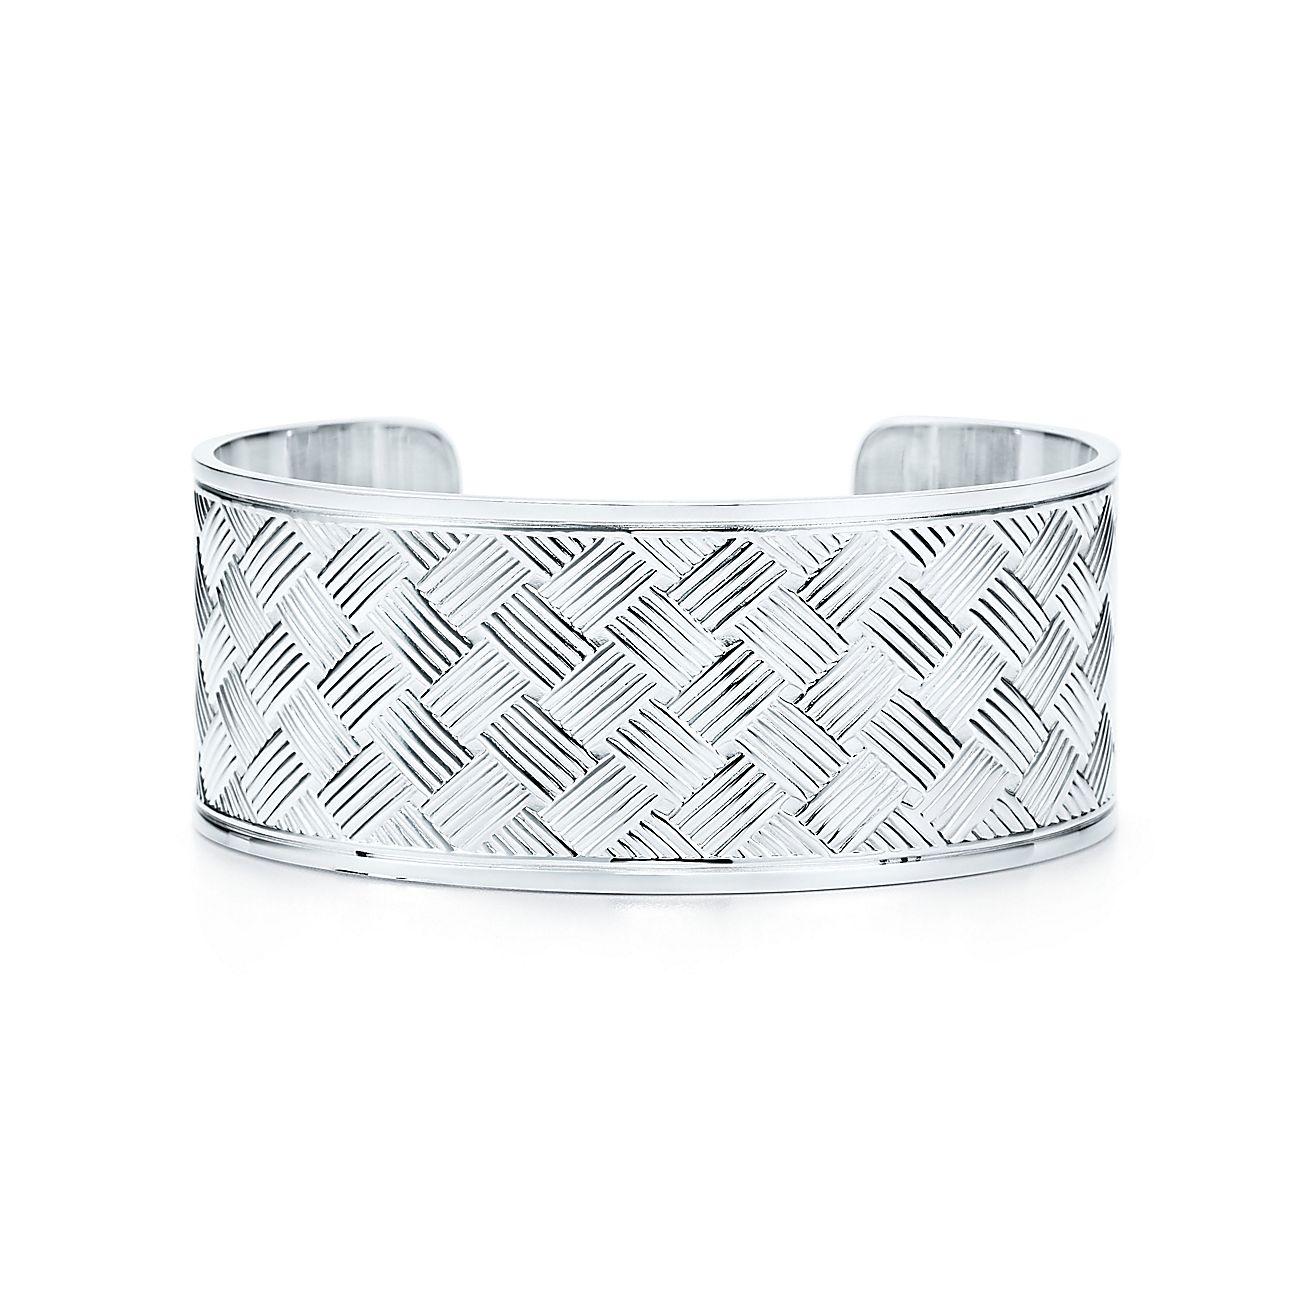 Tiffany Silver Studio:Basket-weave Cuff